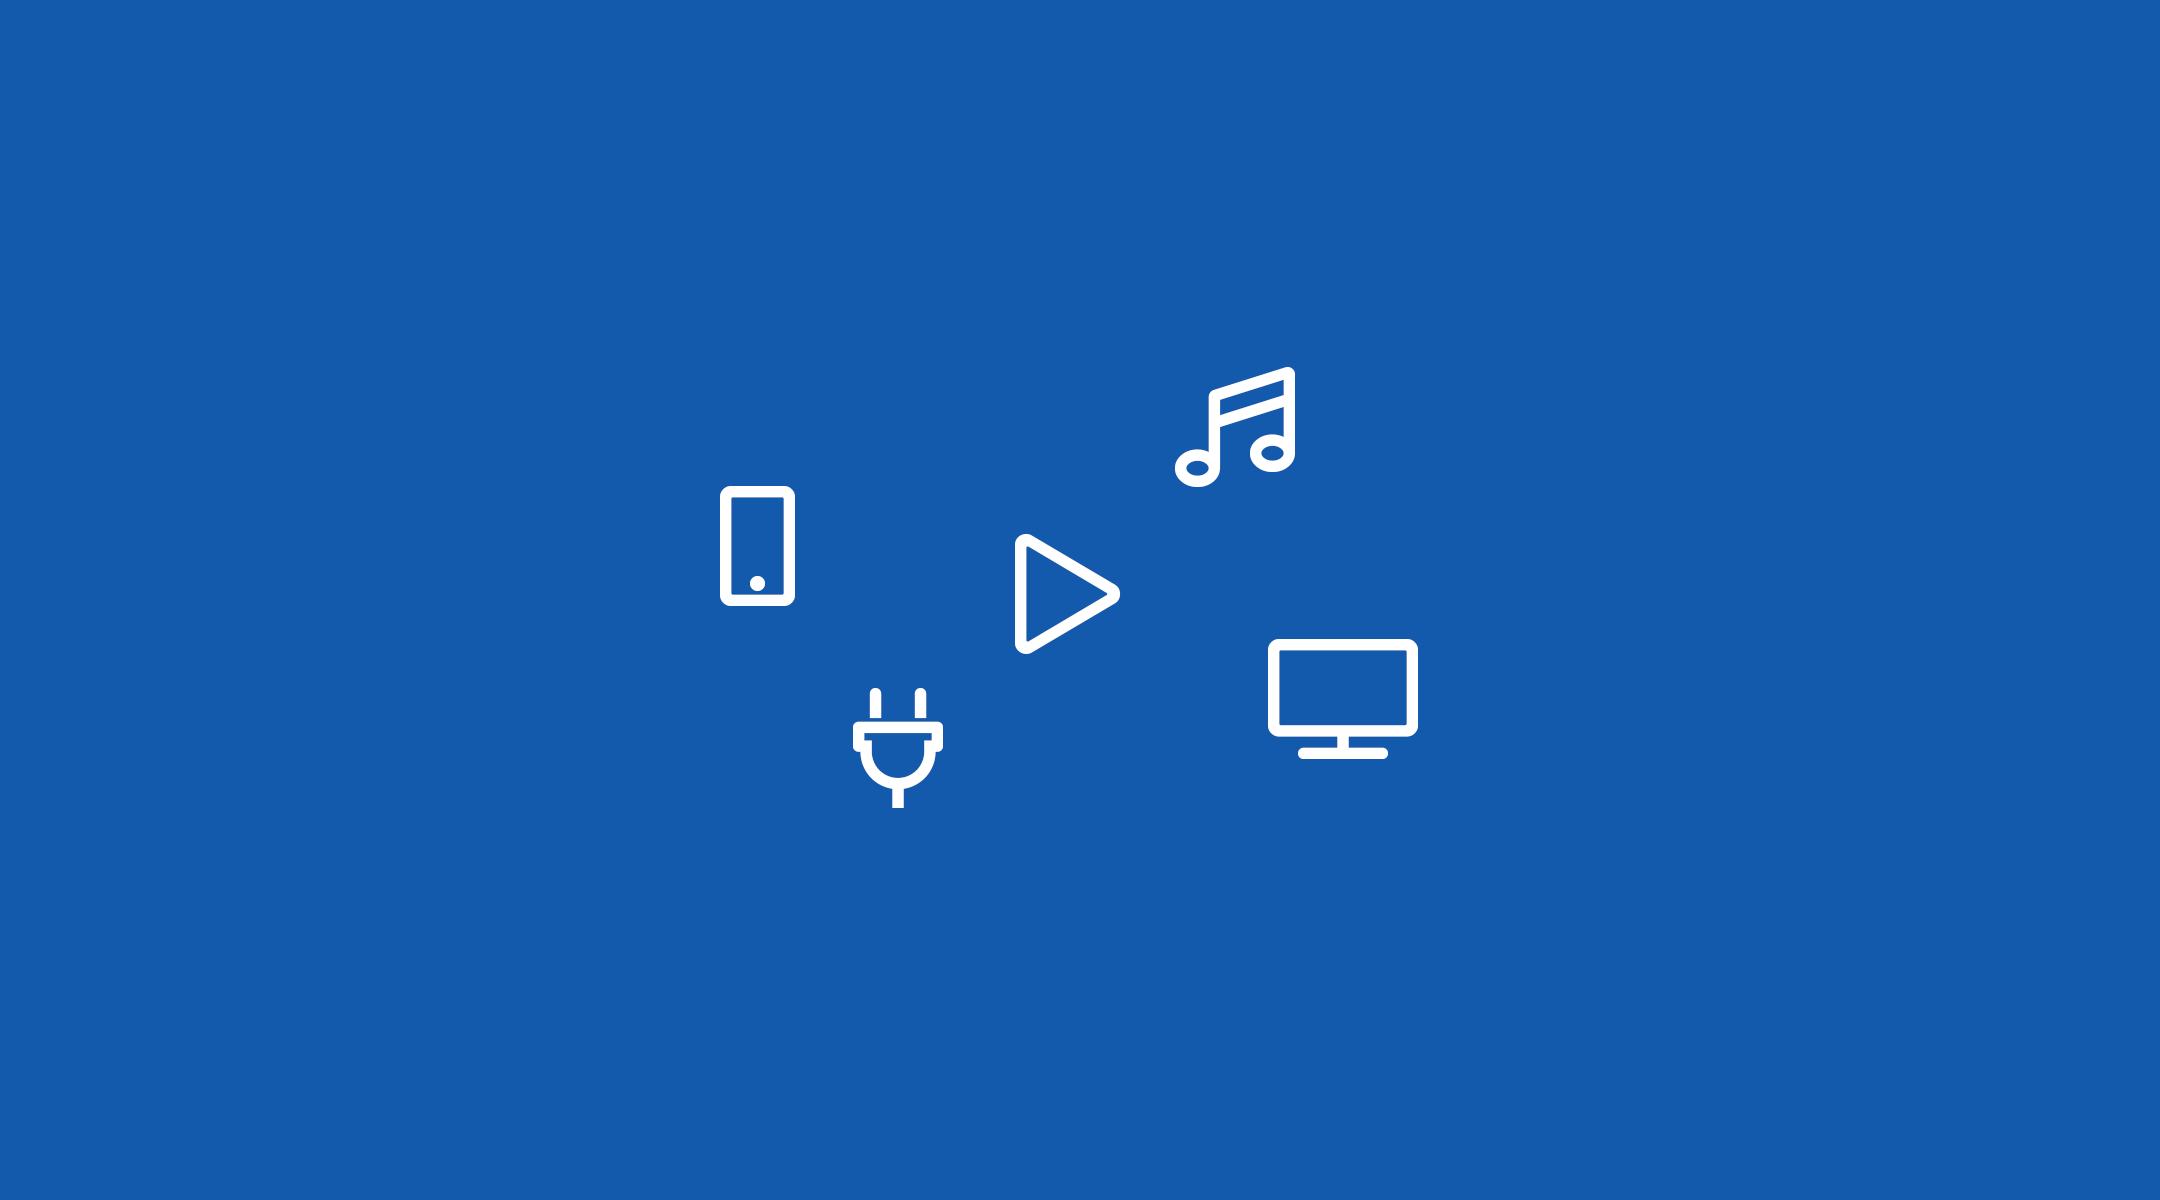 tech symbols on blue background